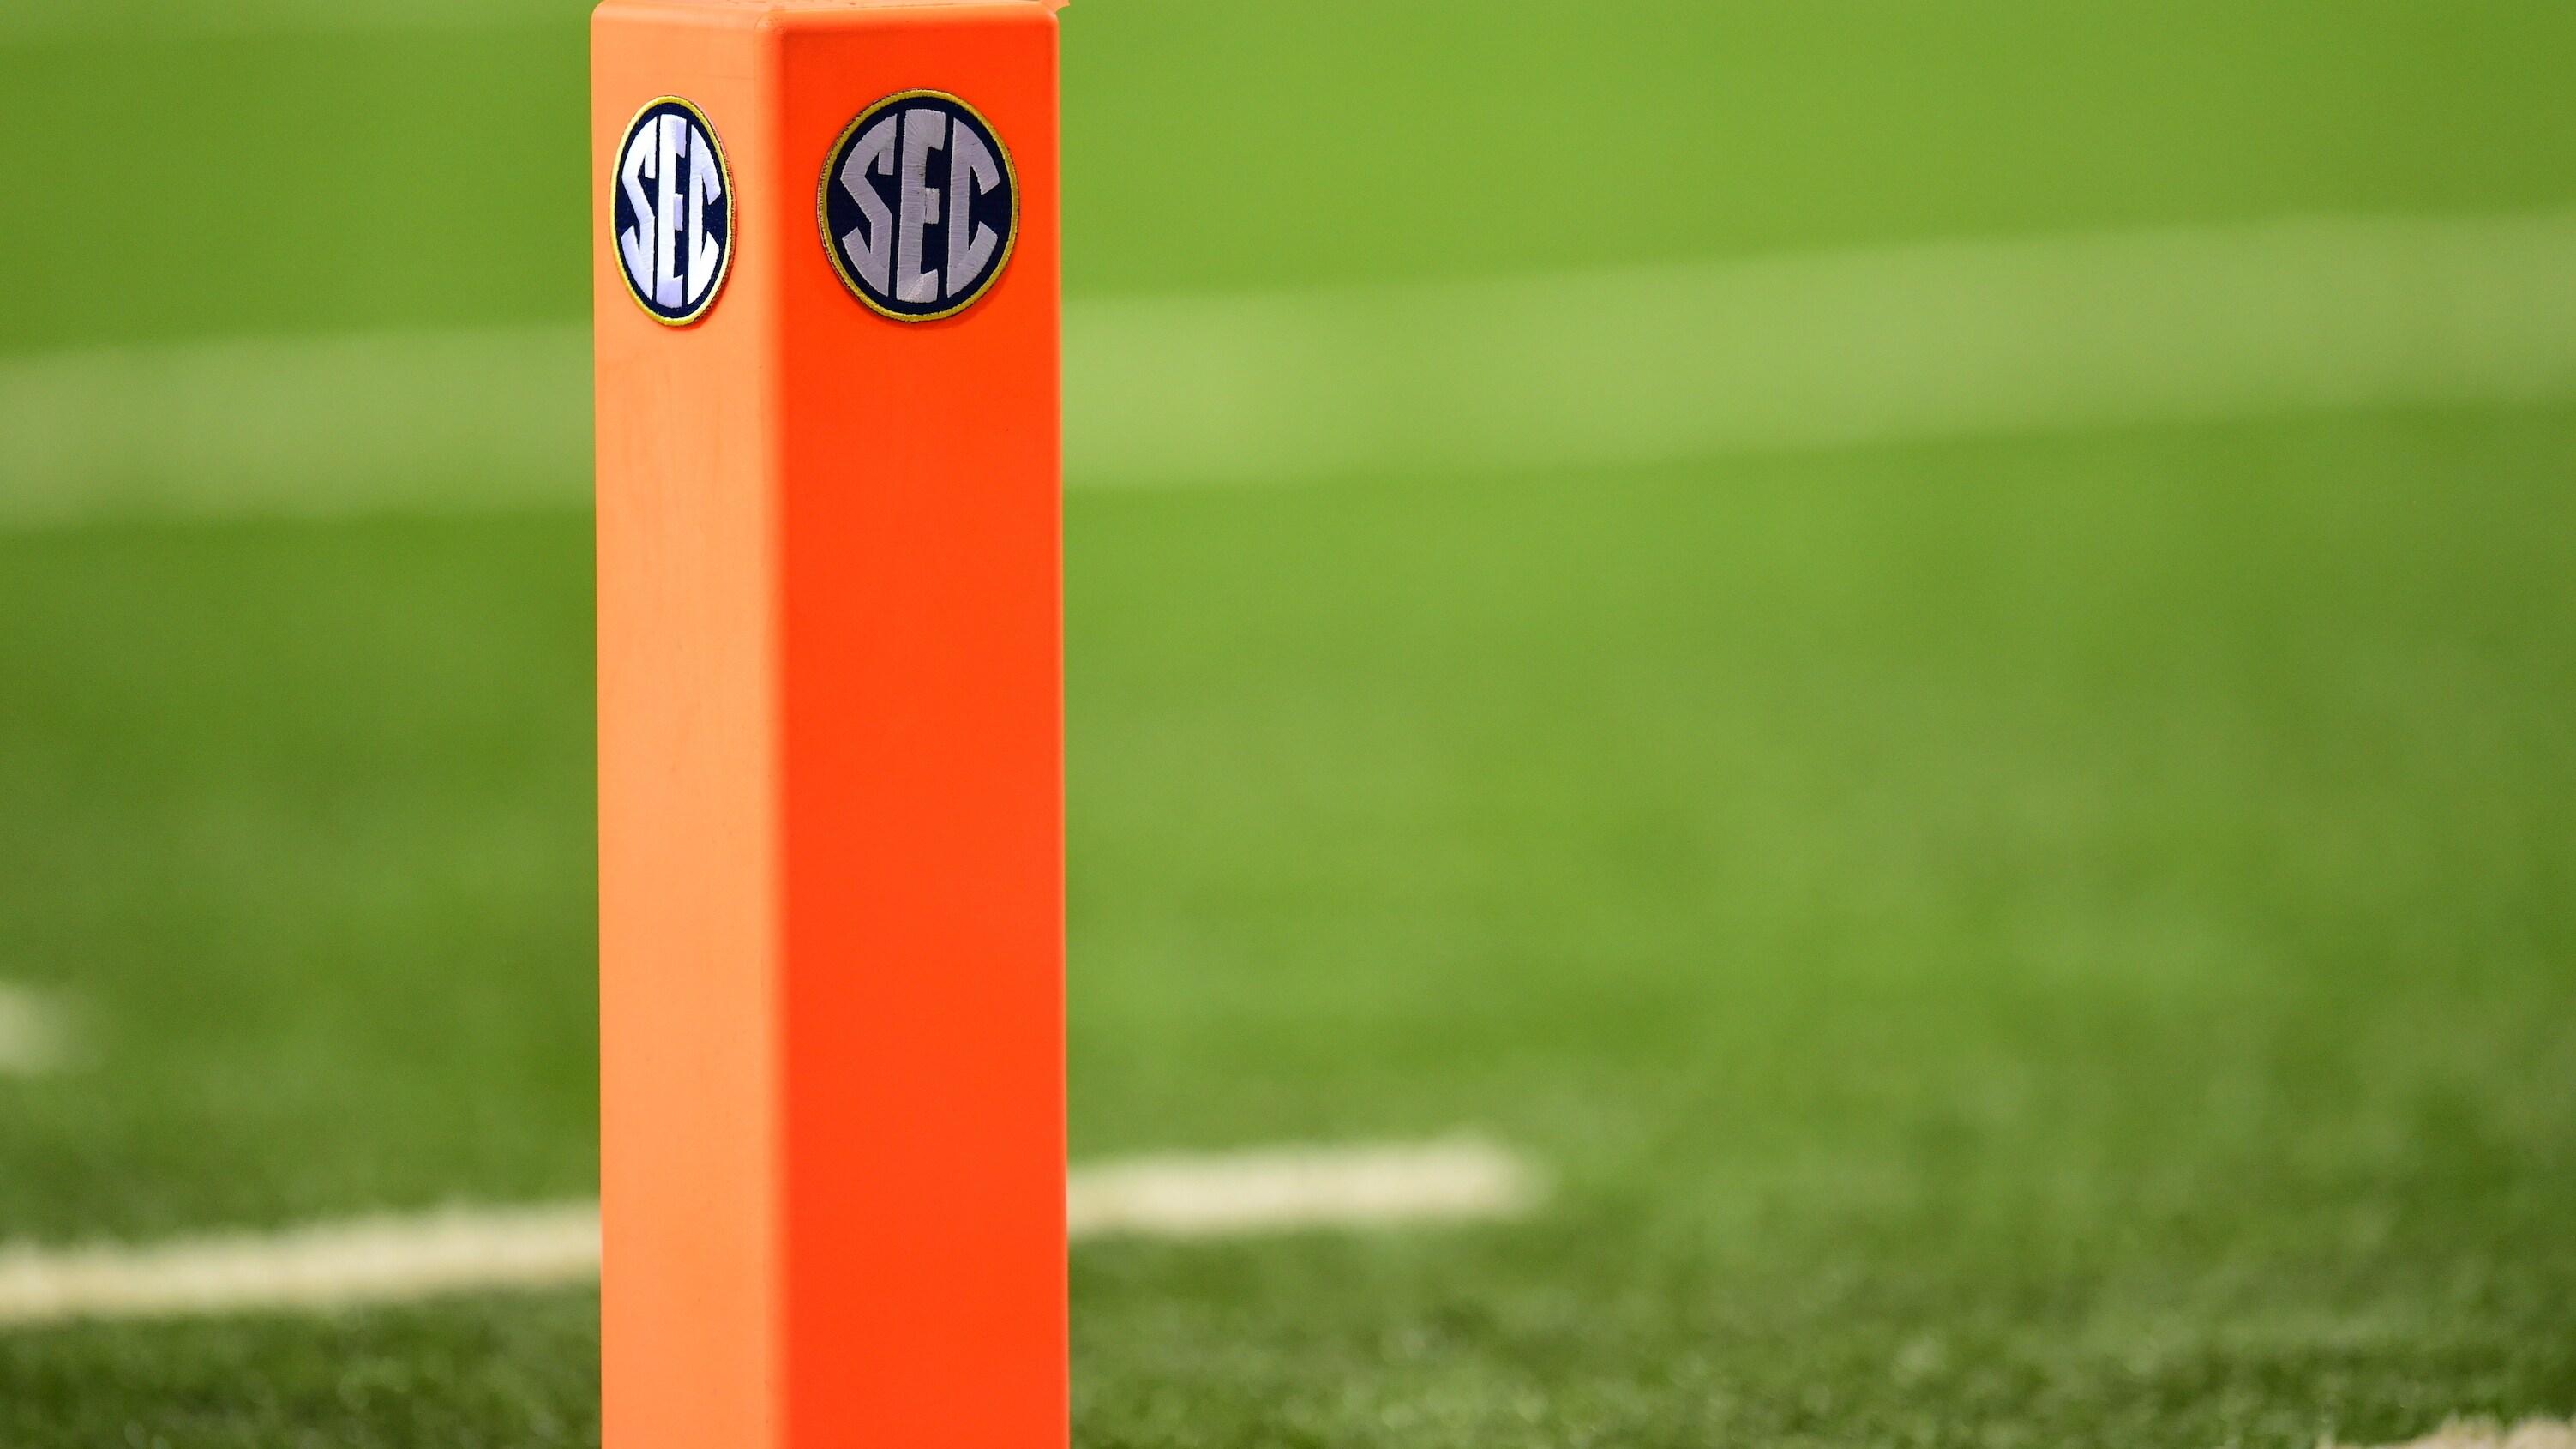 Atlanta, GA - December 6, 2014 - Georgia Dome: SEC logo during the 2014 SEC Championship game (Photo by Phil Ellsworth / ESPN Images)